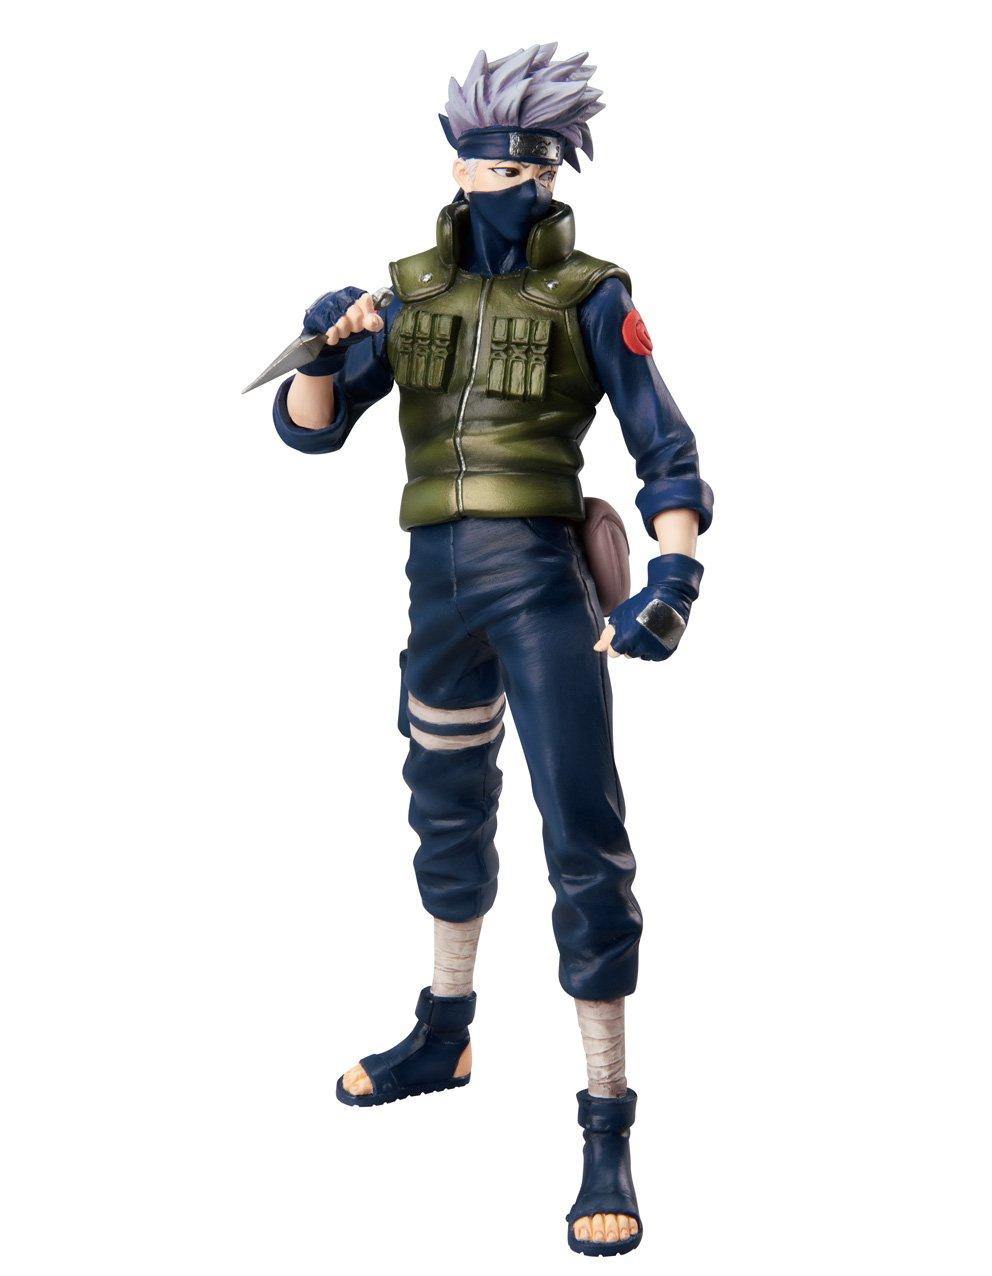 ahorra 50% -75% de descuento Naruto Naruto Naruto Shippuden MegaHouse Deluxe 9 Inch PVC G.E.M. Series Statue Kakashi Hatake (japan import)  marca de lujo